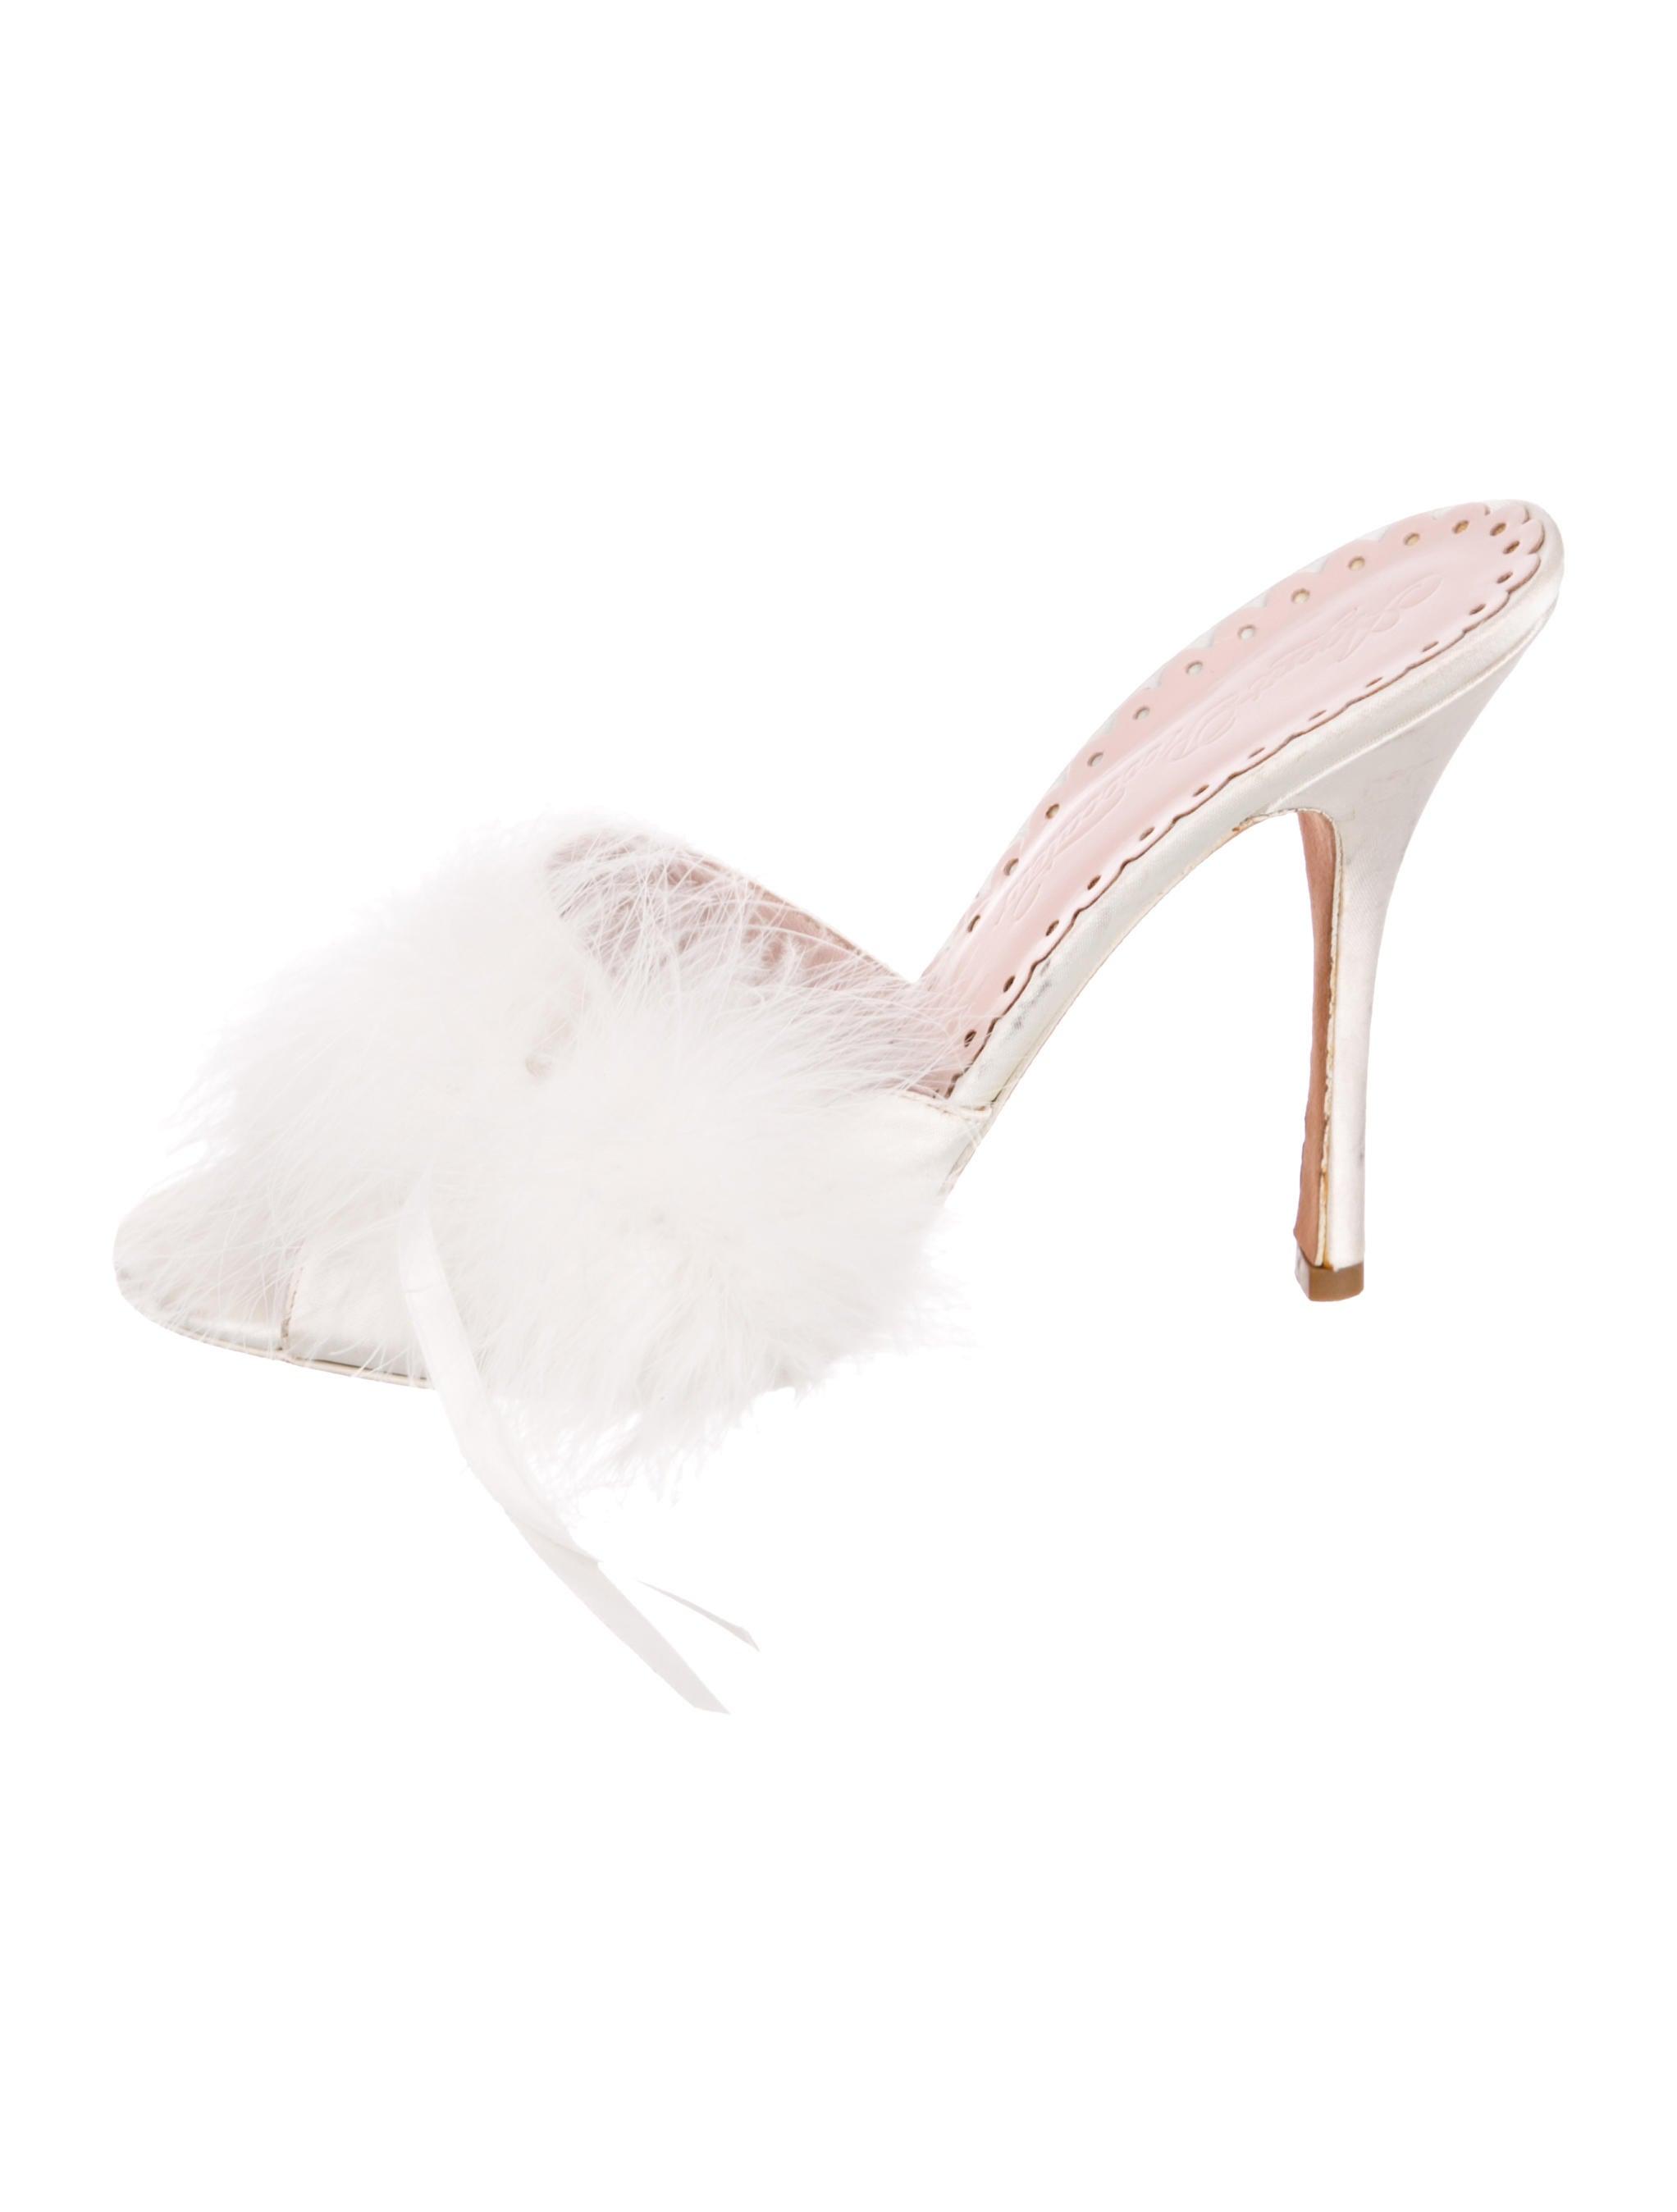 Agent Provocateur Feather-Trimmed Slide Sandals outlet 2014 newest 1xvq0s1dV